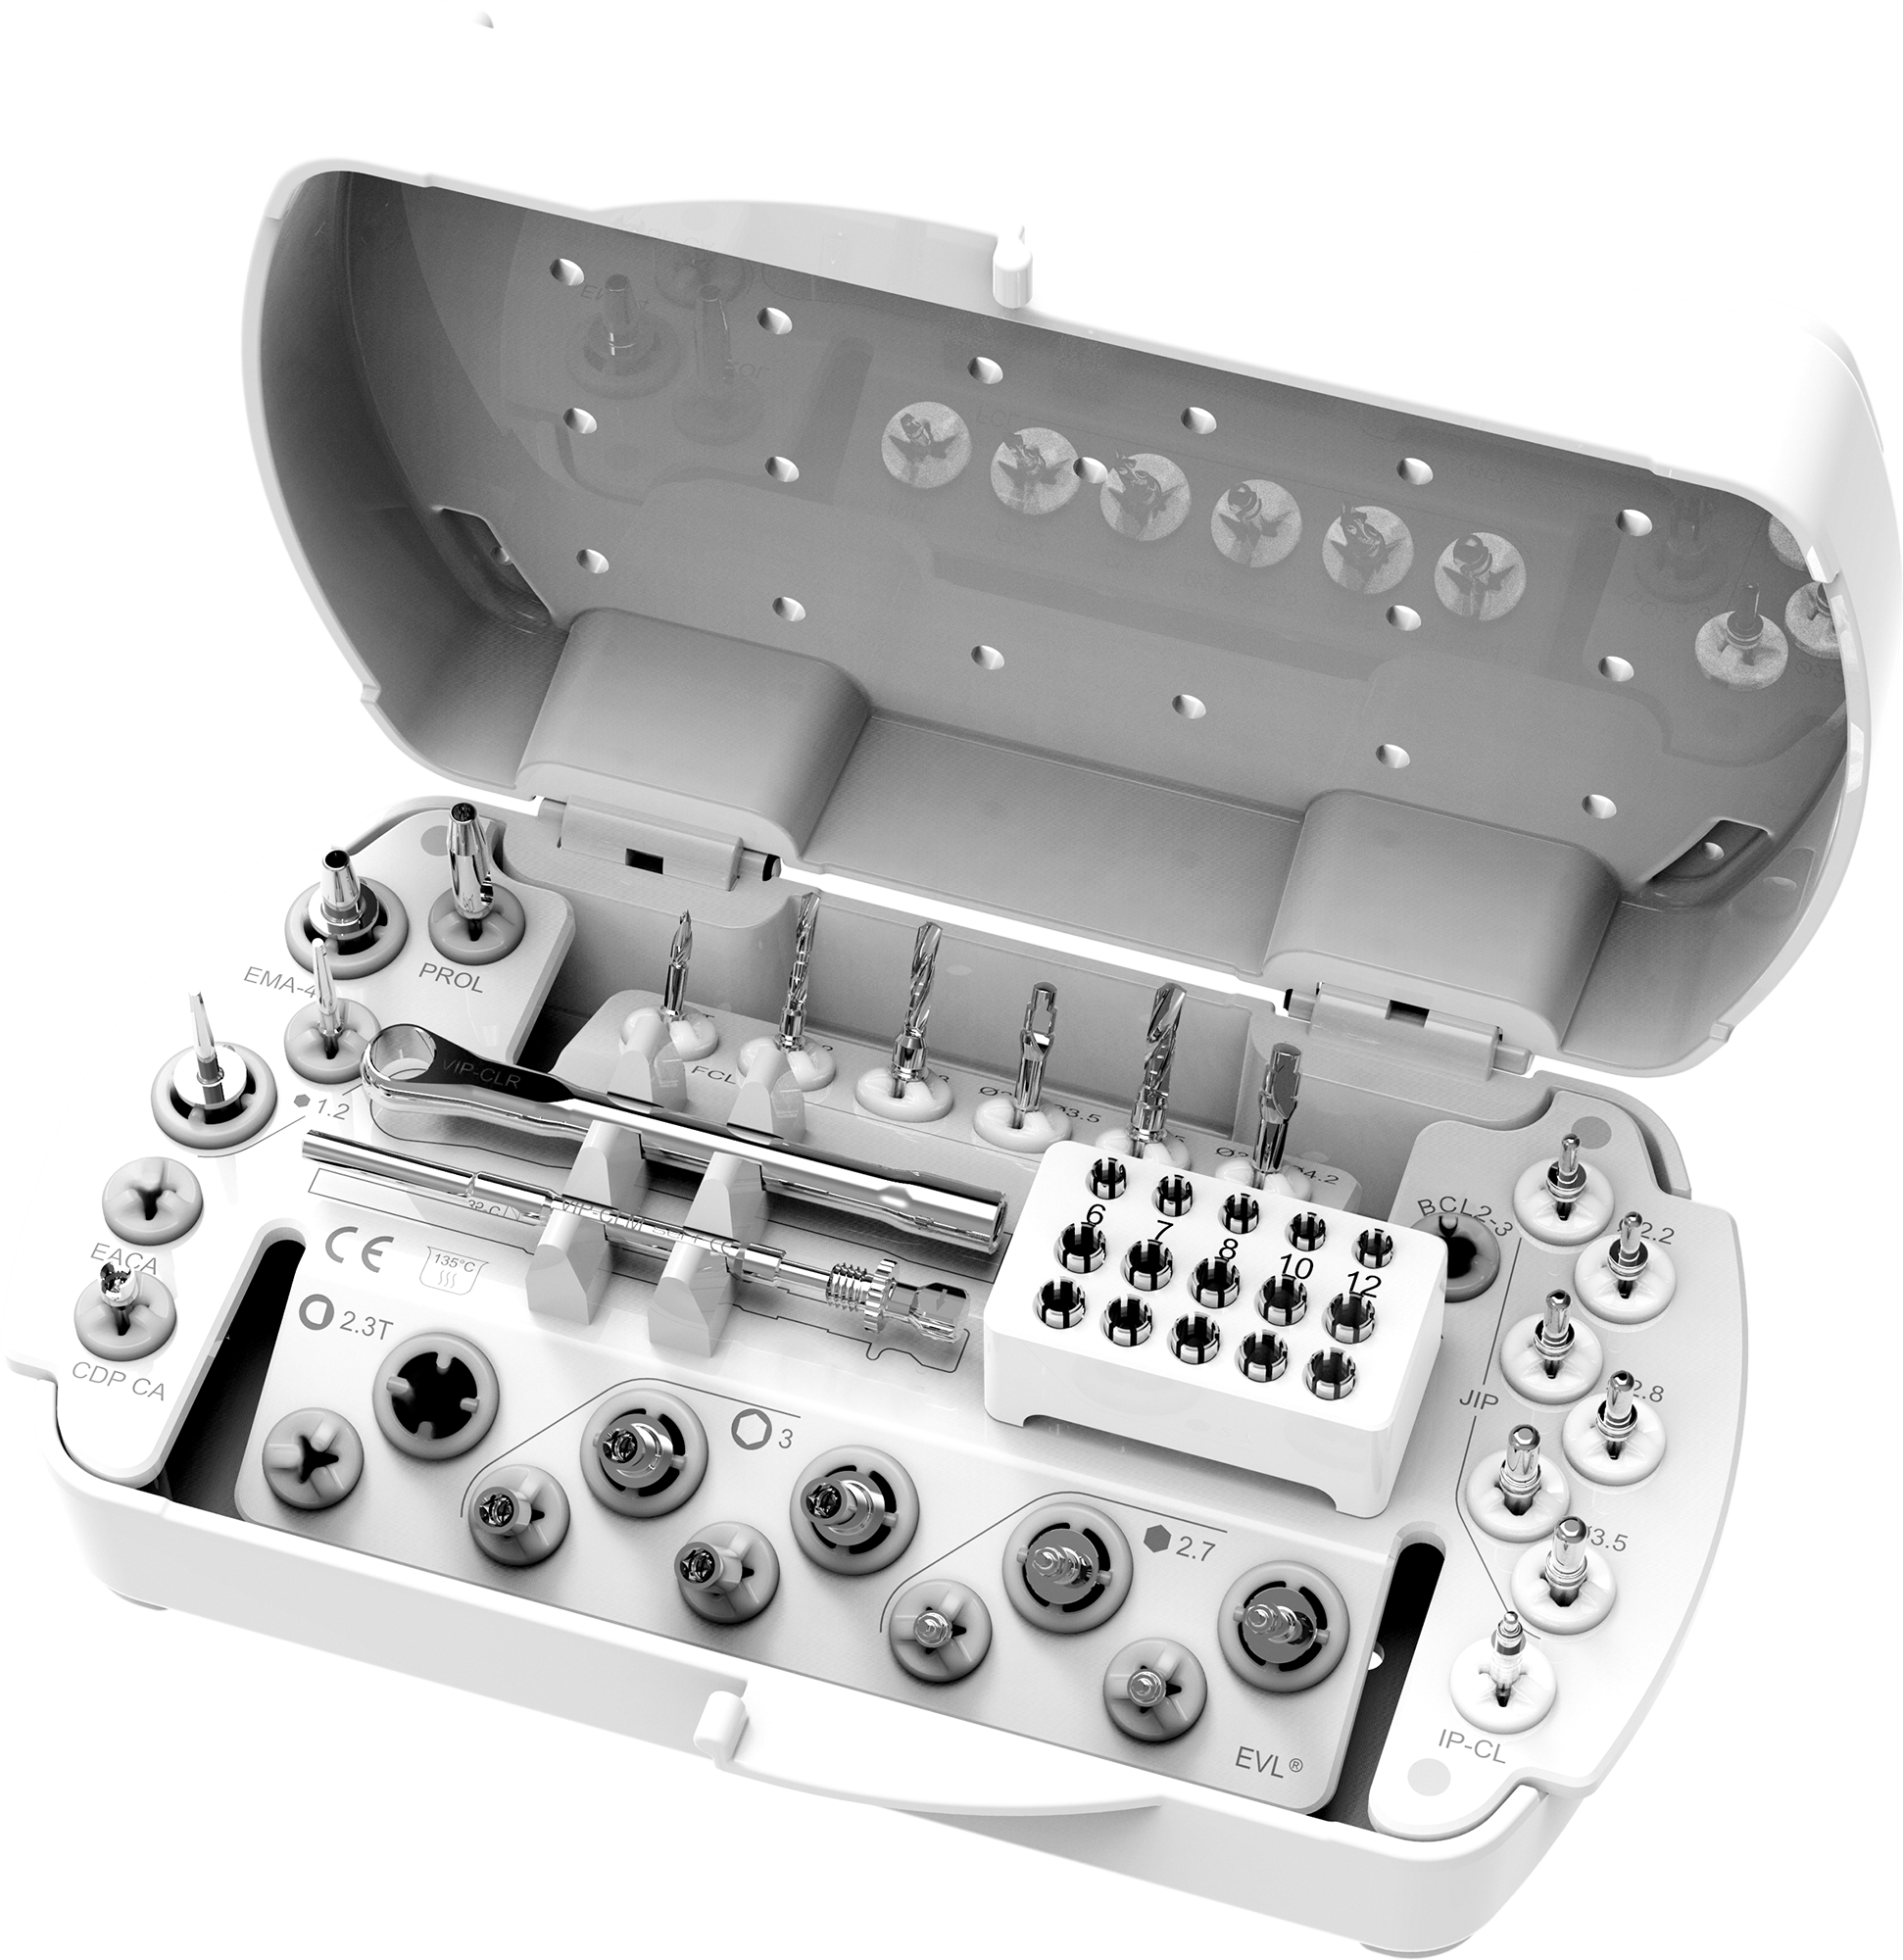 Kit de cirugía EVL®